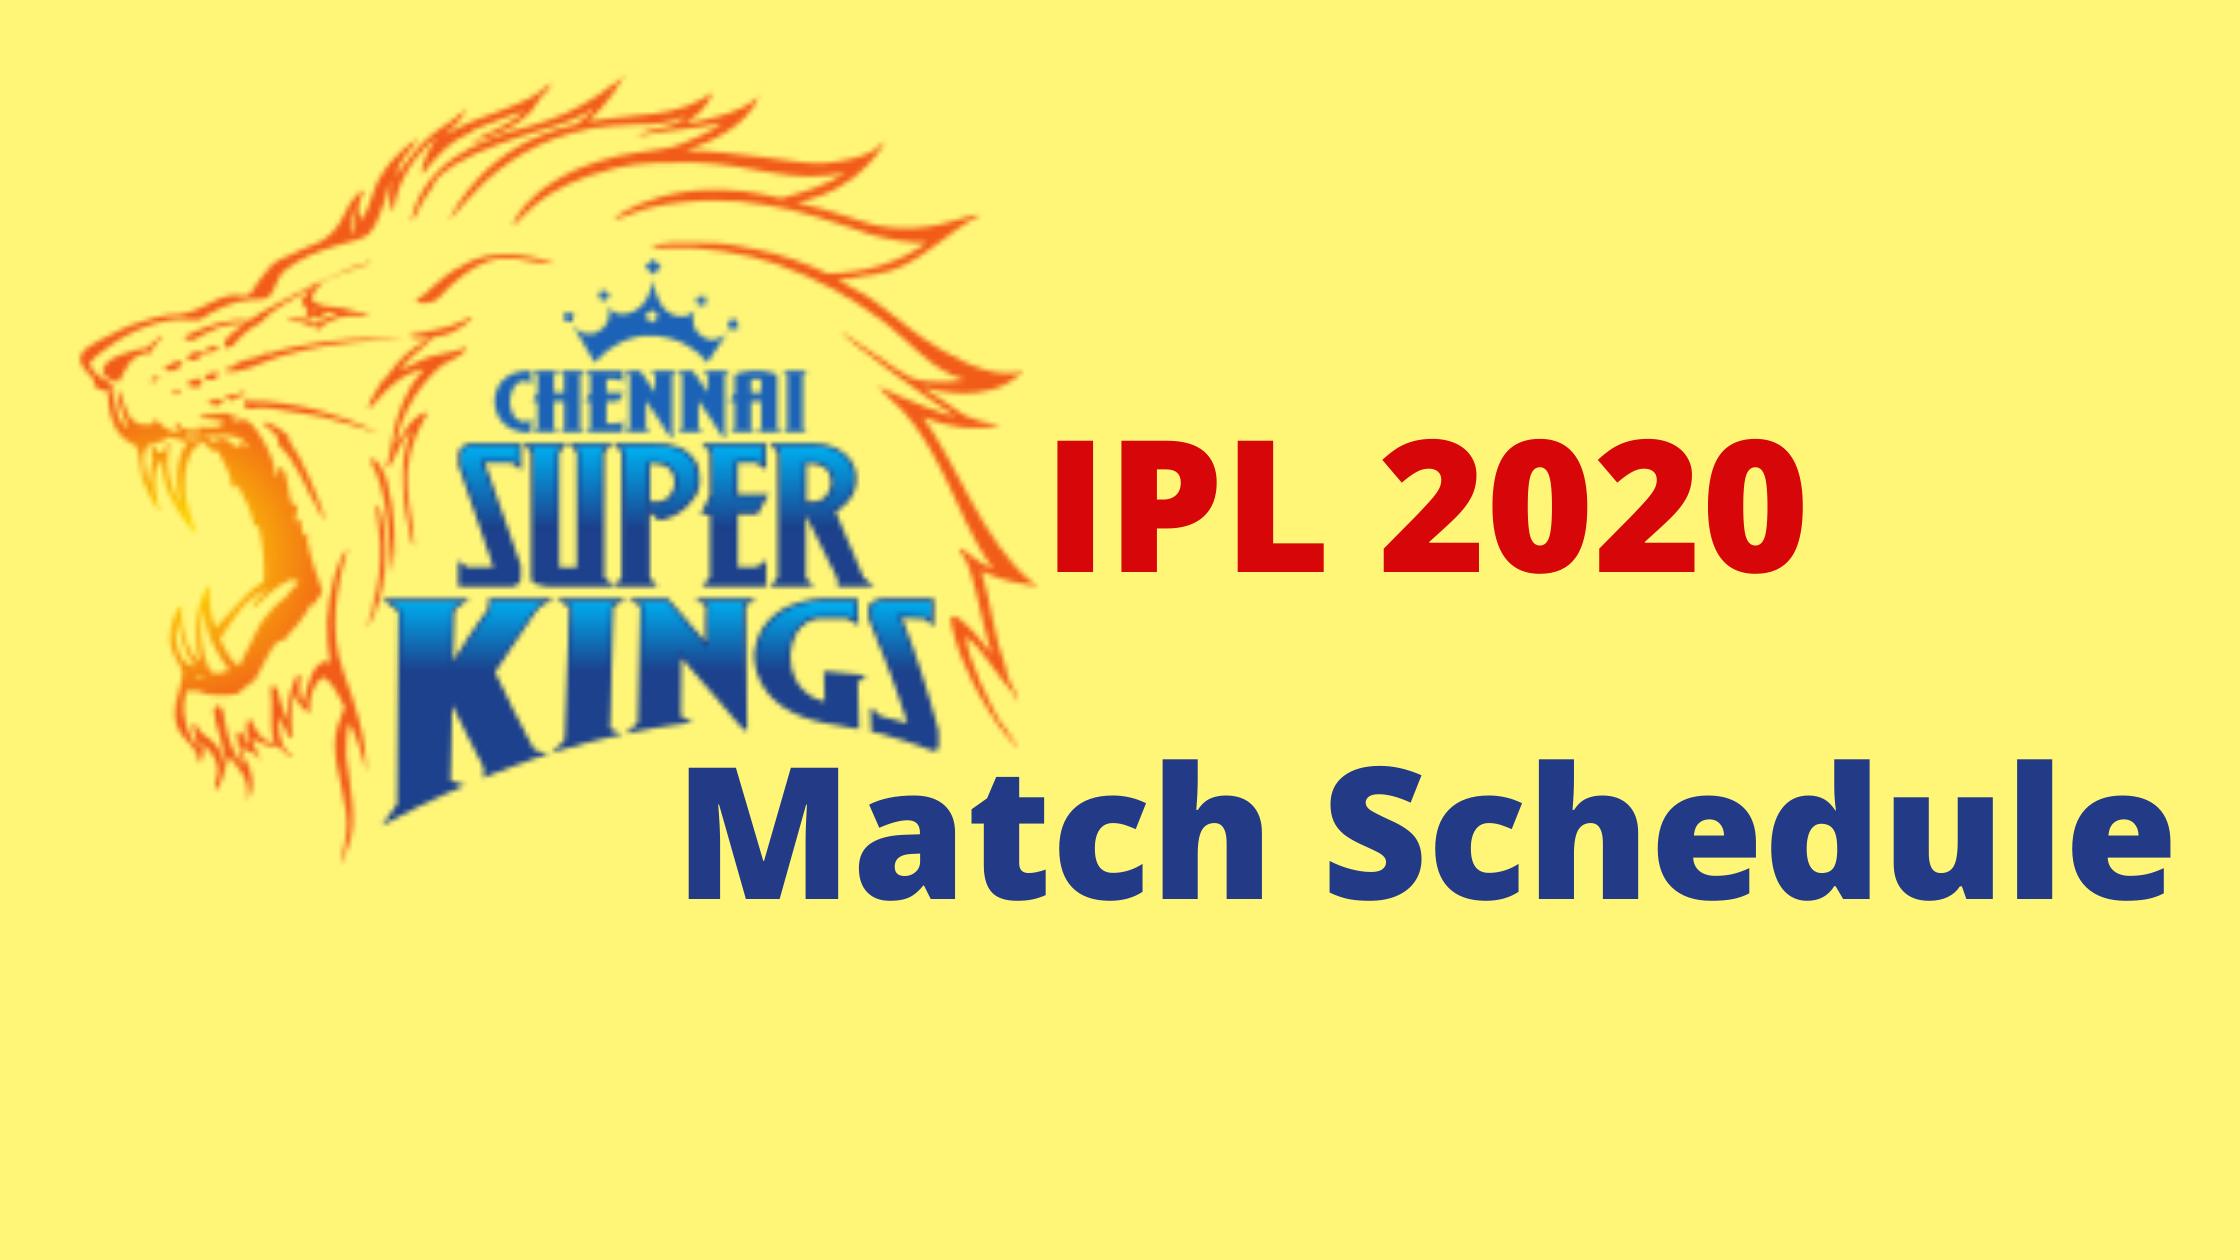 Dream11 IPL 2020 Chennai Super Kings Match Schedule